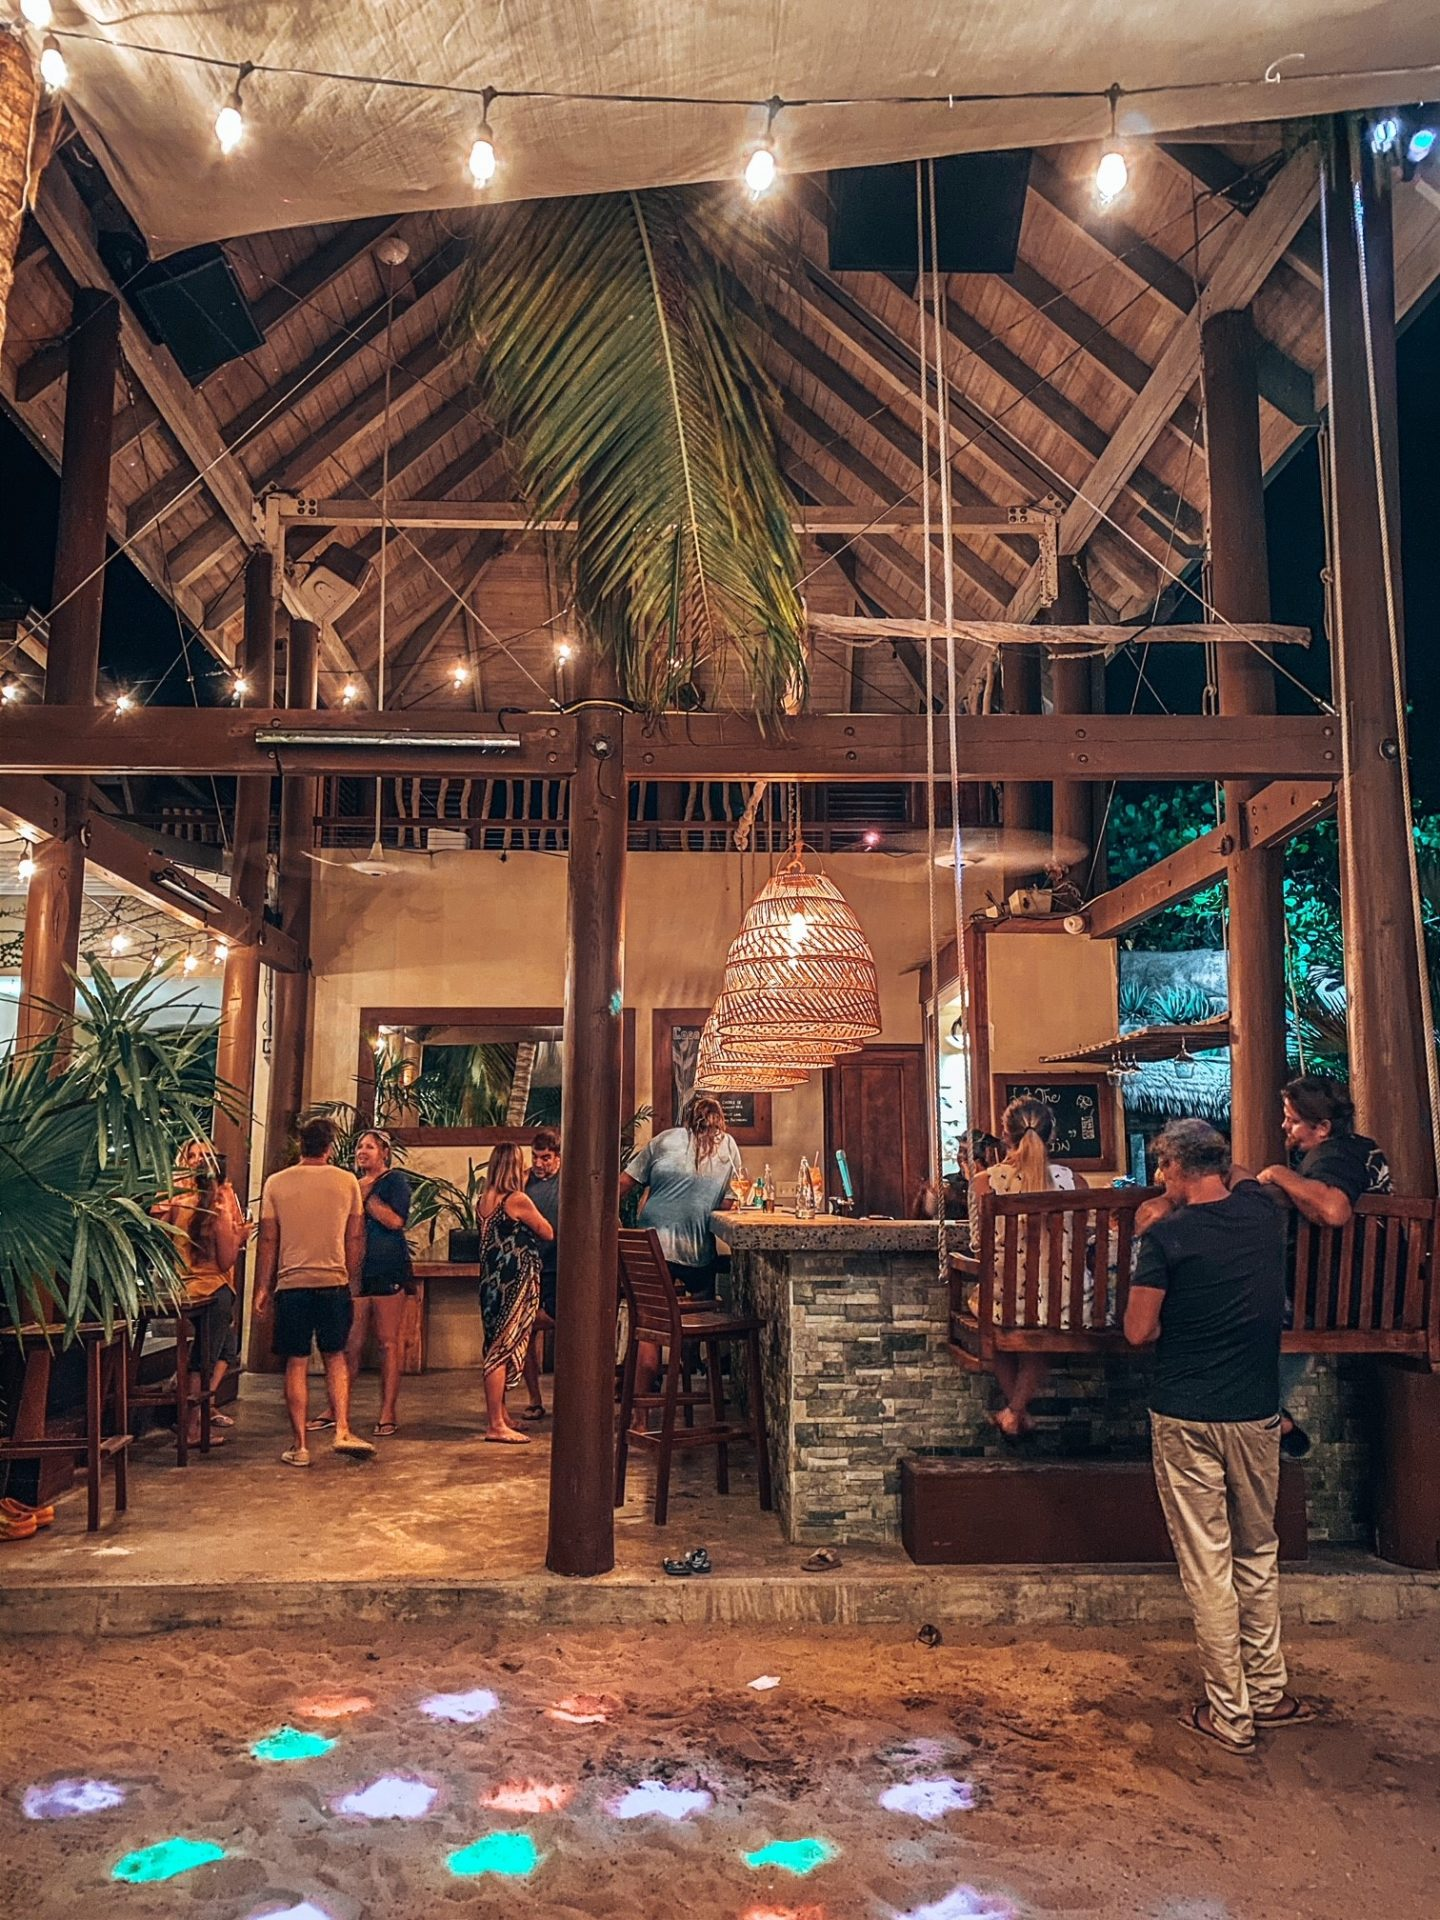 CocoMaya - Virgin Gorda, British Virgin Islands